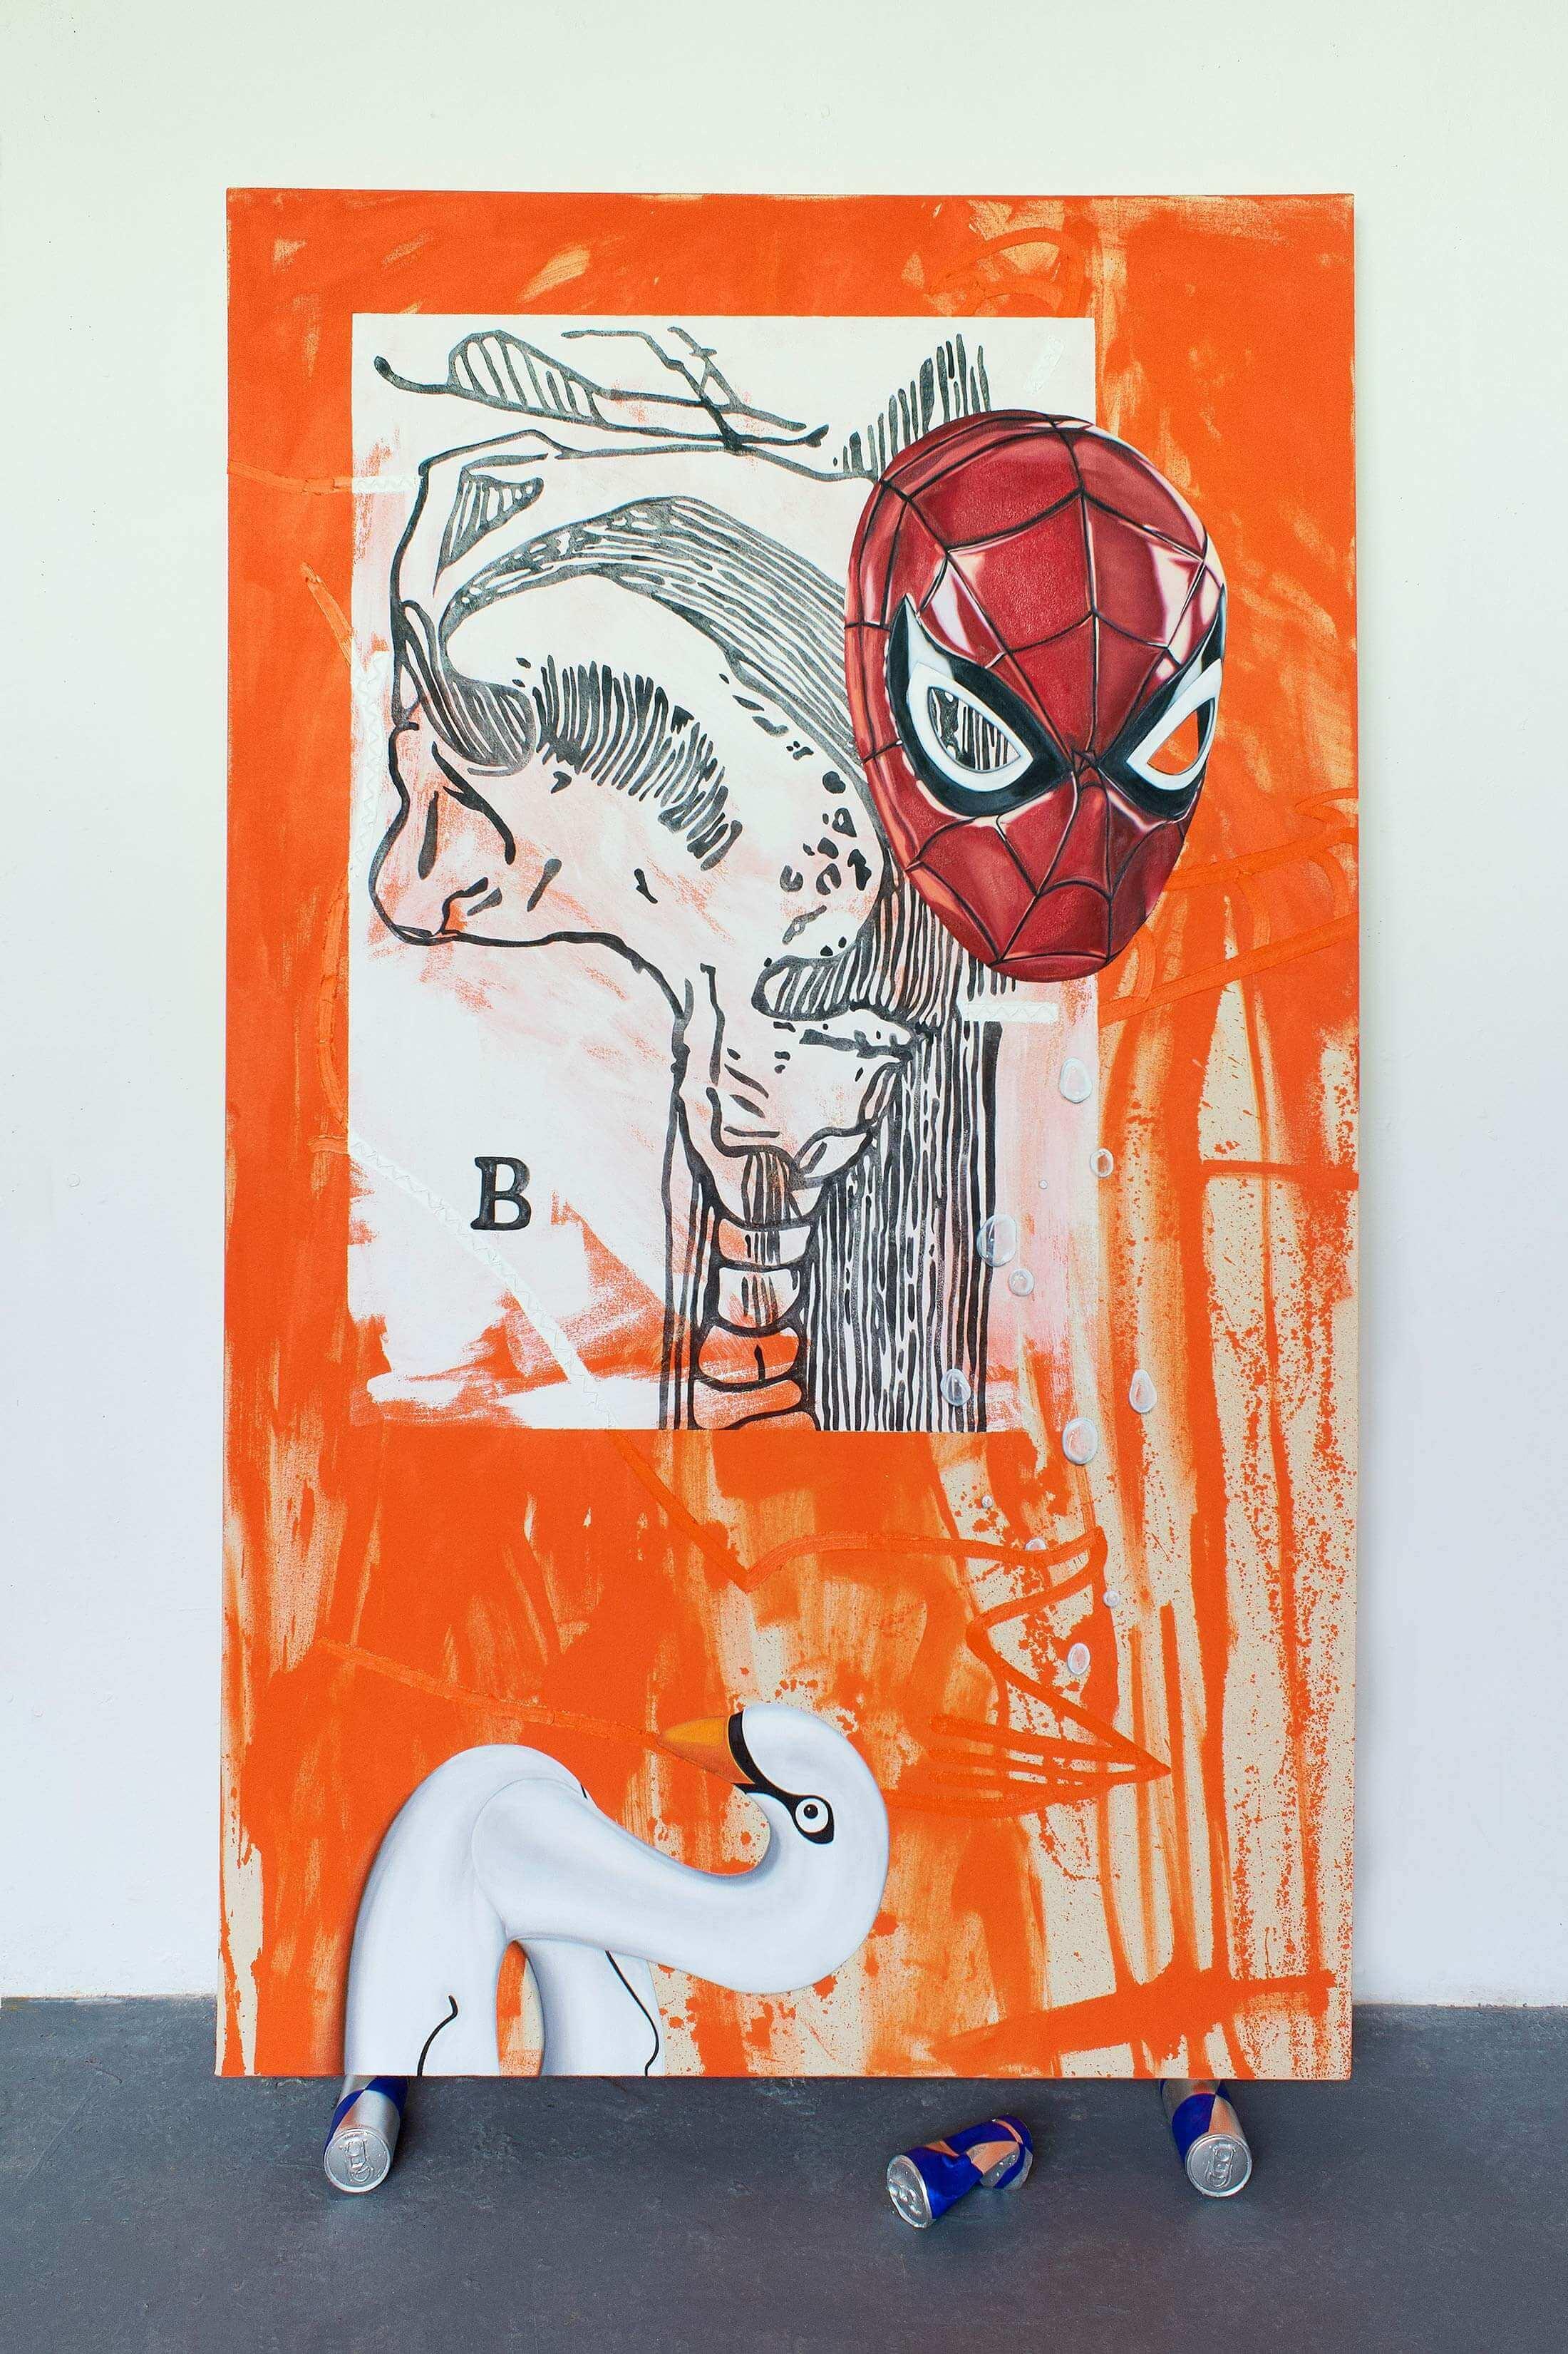 god complex, spiderman in art, comic, emerging, artwork, red bull, orange, mixed media,